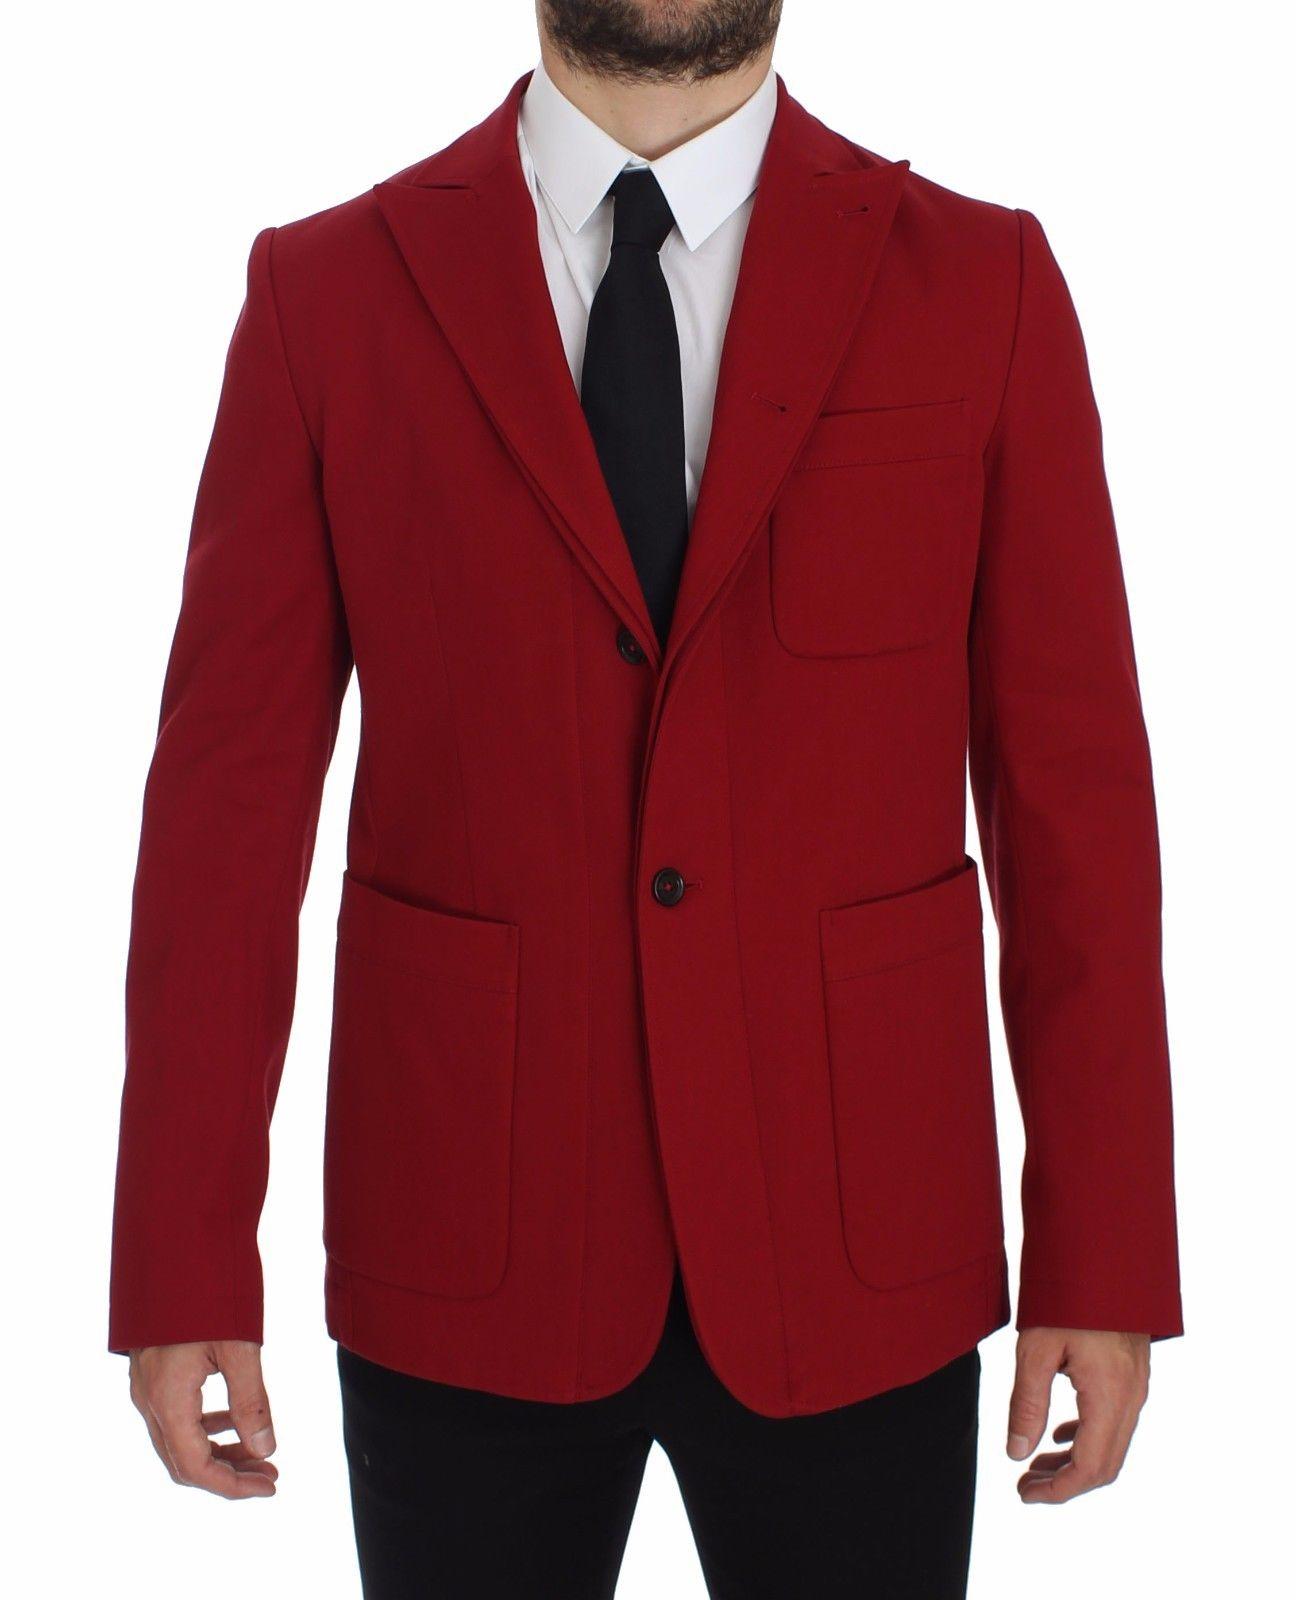 Dolce & Gabbana Men's Cotton Stretch Blazer Red GTT10106 - IT50 | L